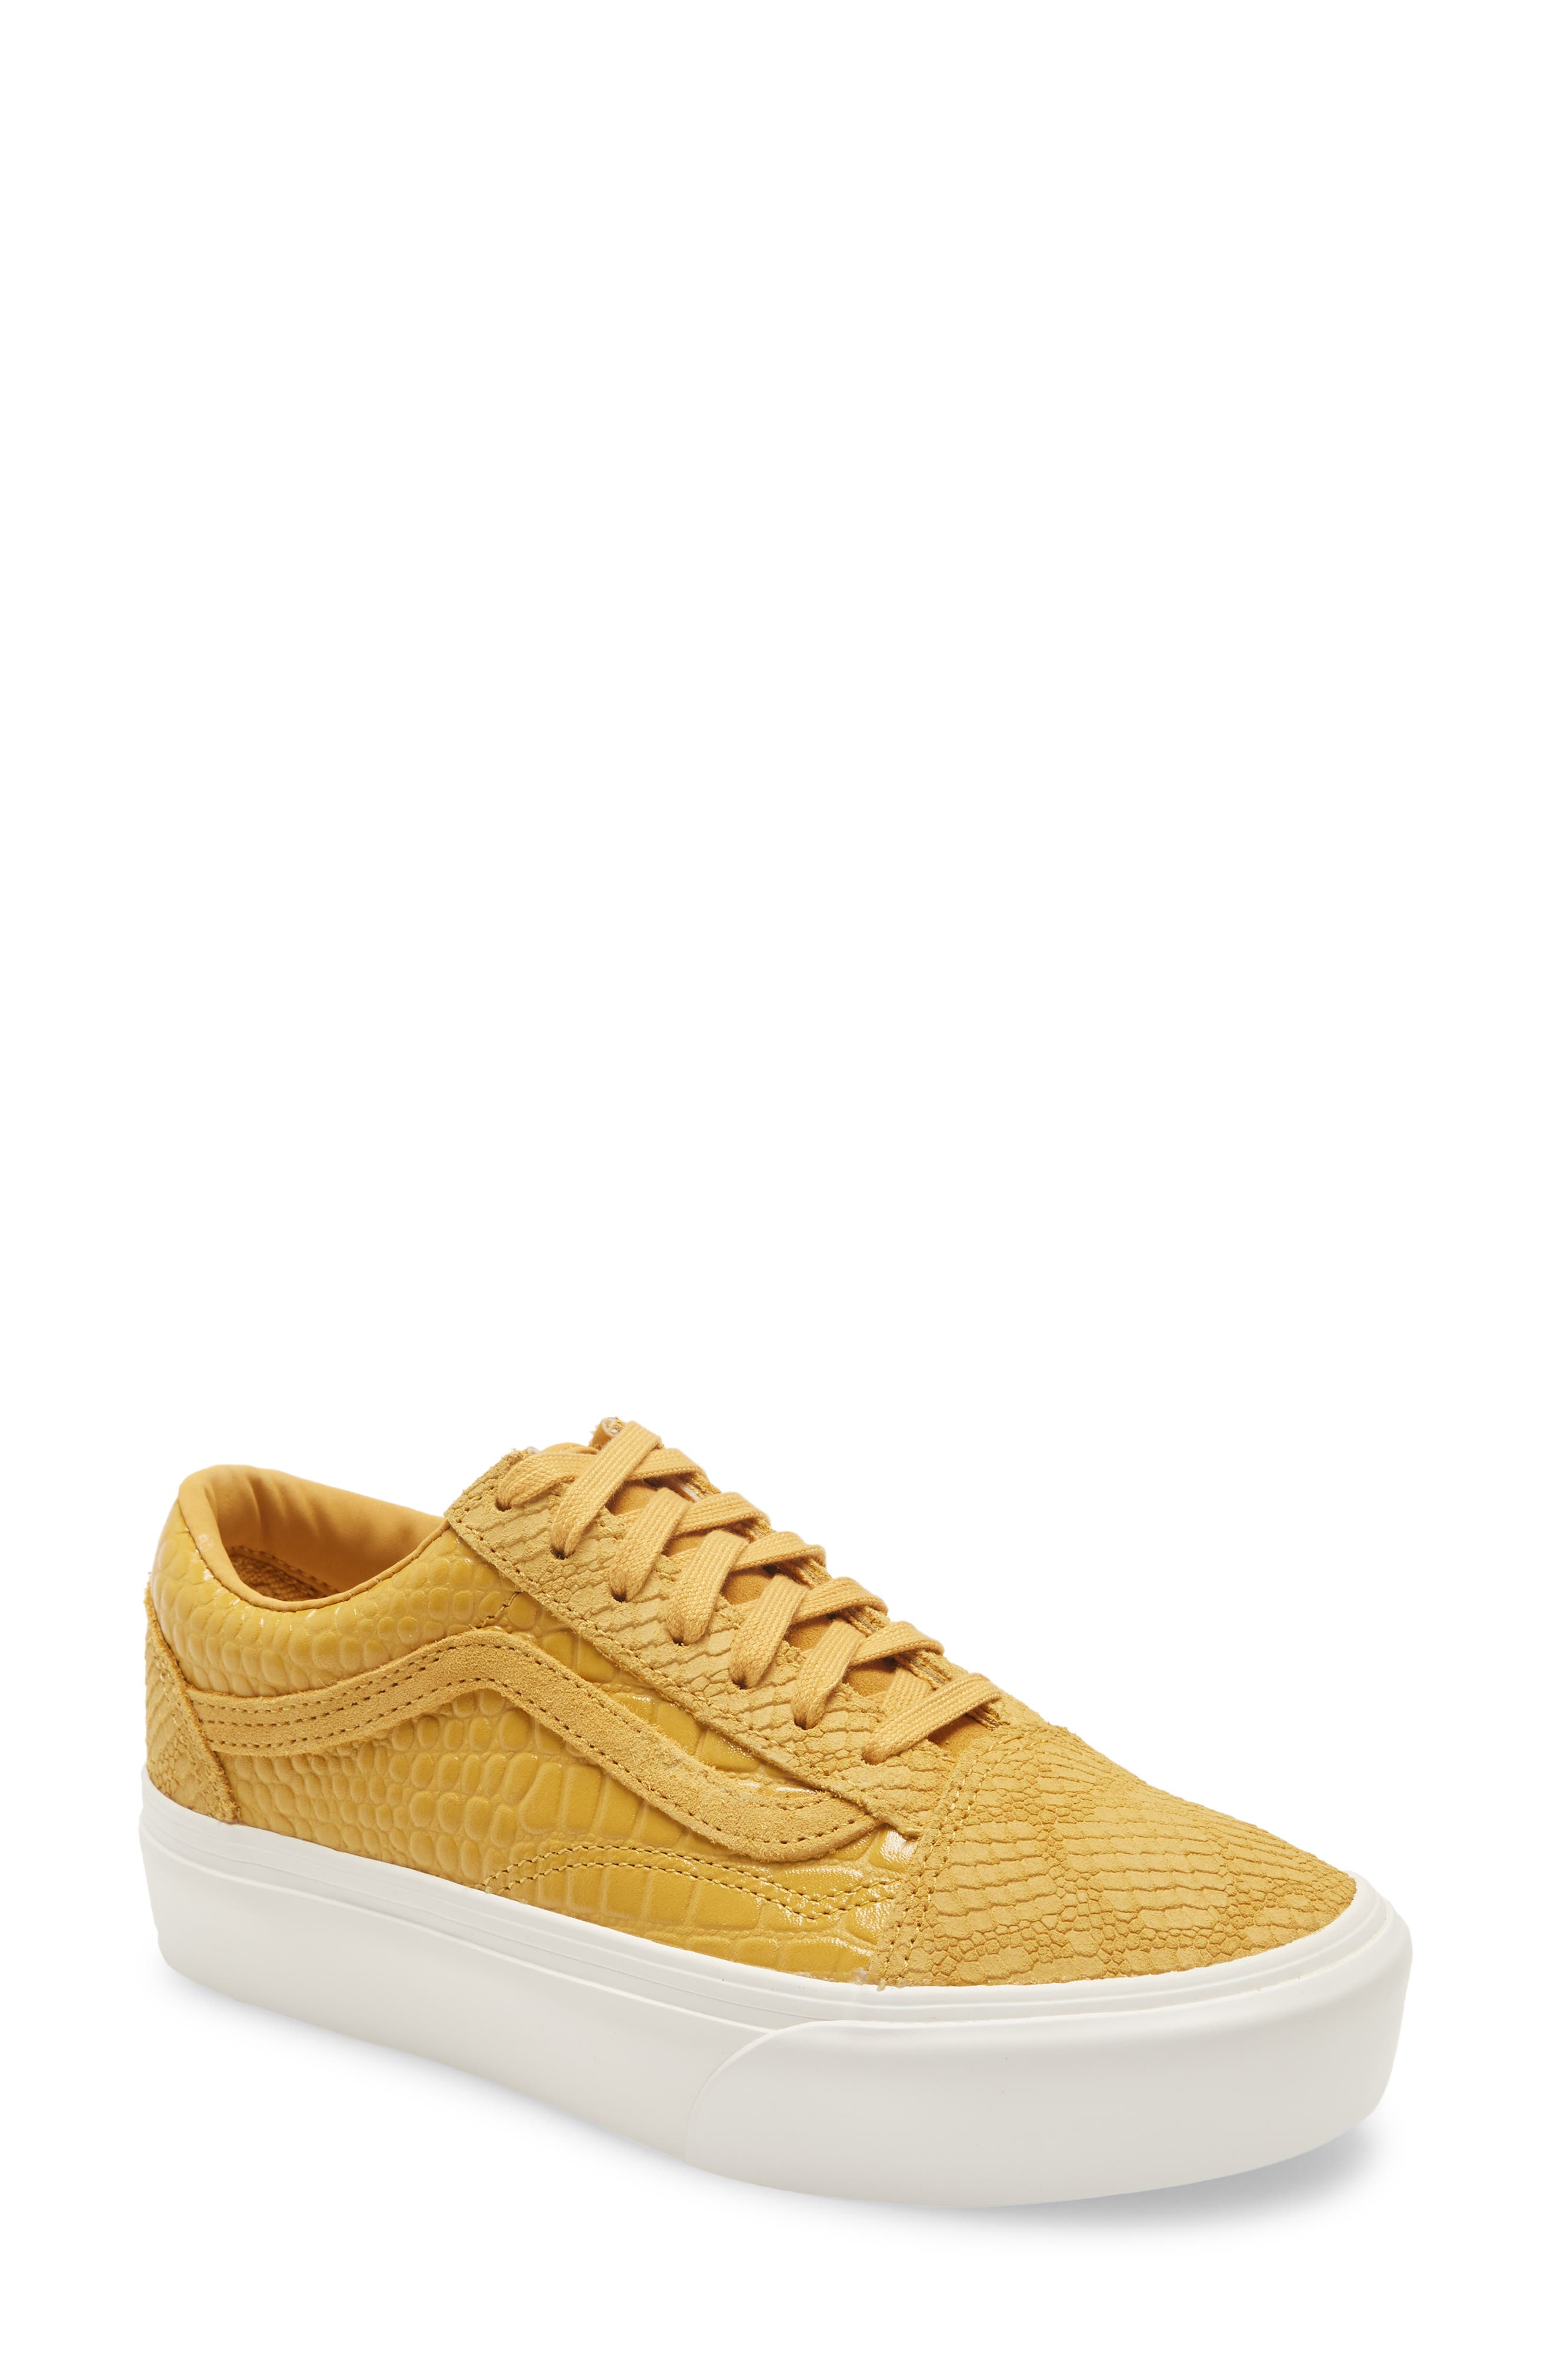 Women s Vans Old Skool Platform Sneaker E574